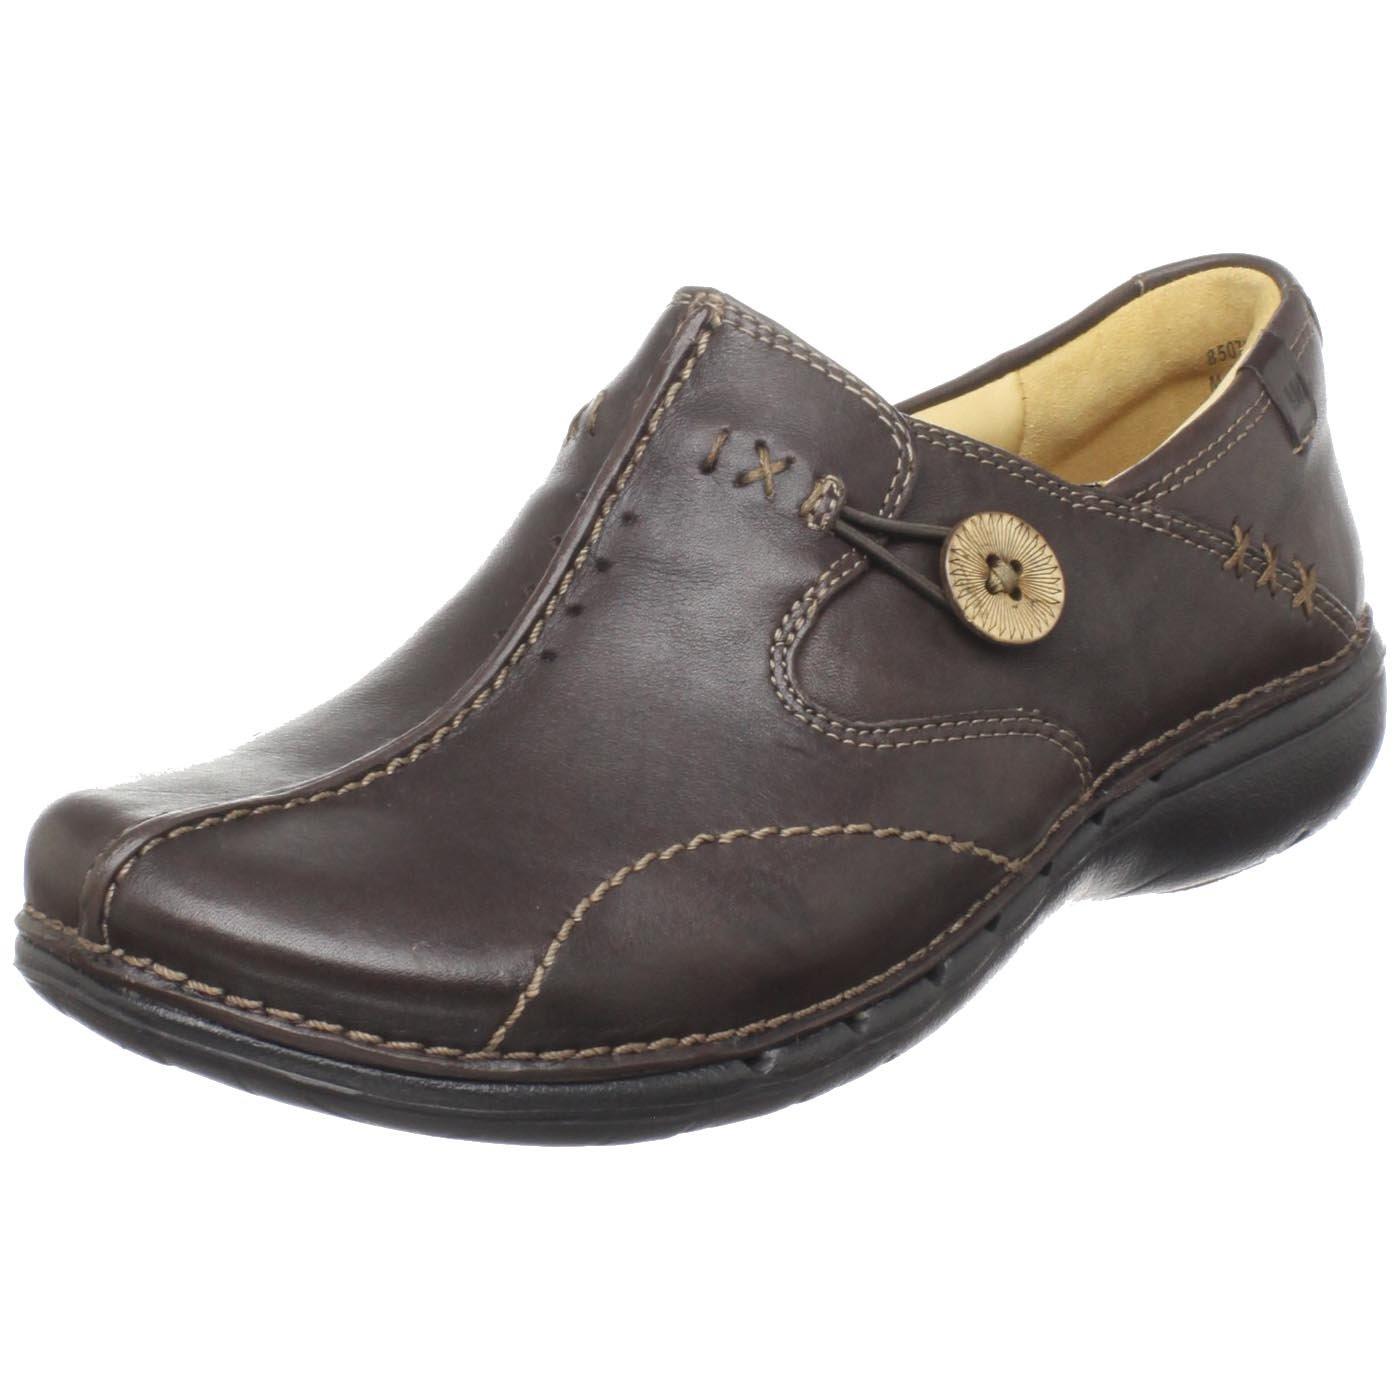 marron Clarks Unstructurouge Unstructurouge Wohommes Un.Loop Slip-on chaussures